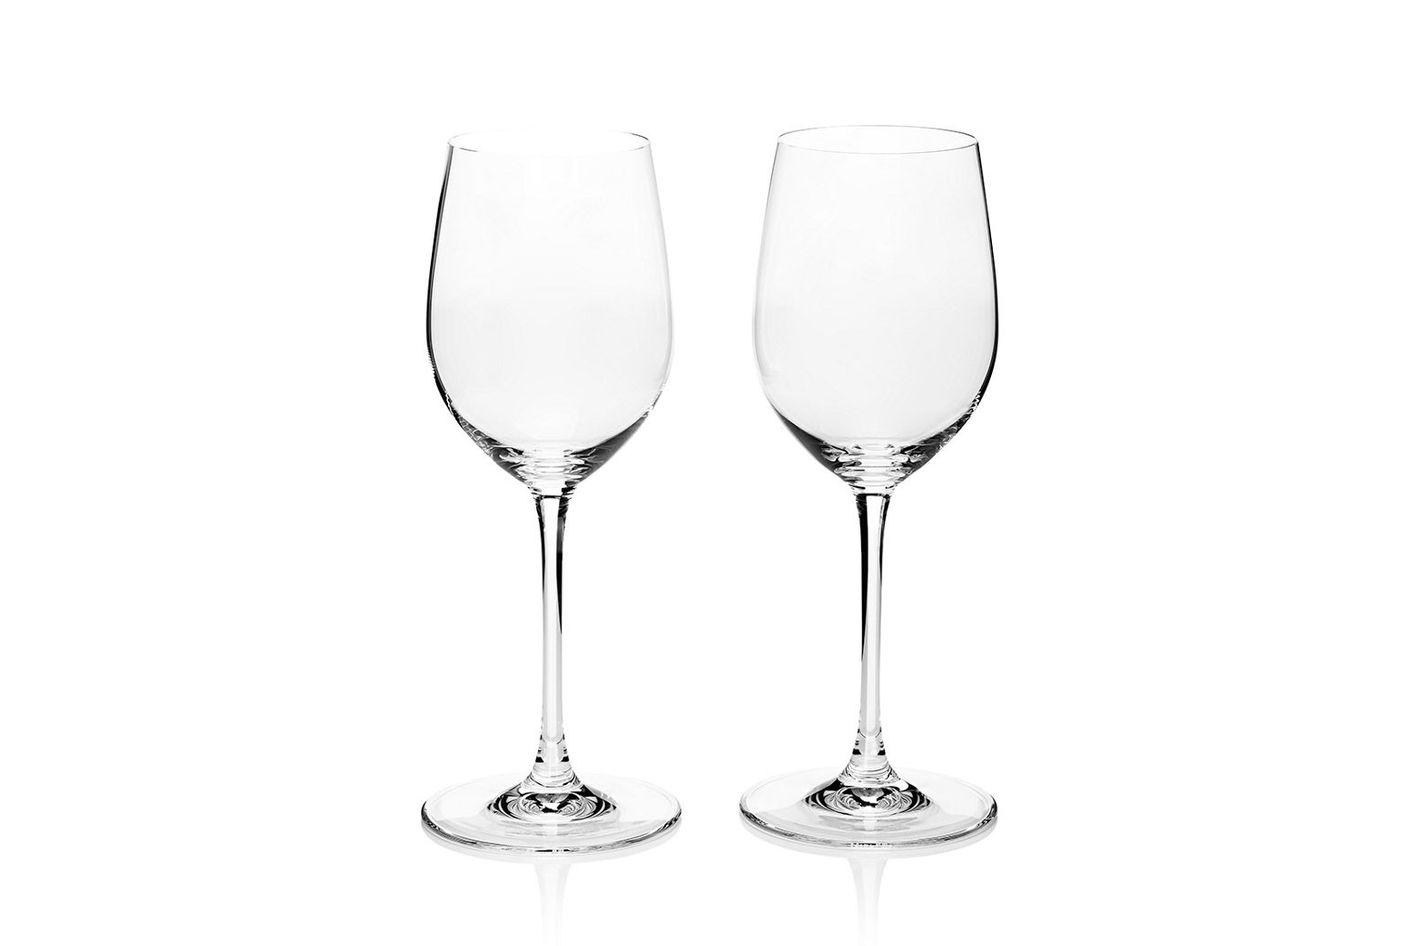 Riedel Set of 2 Vinum XL Wine Glasses